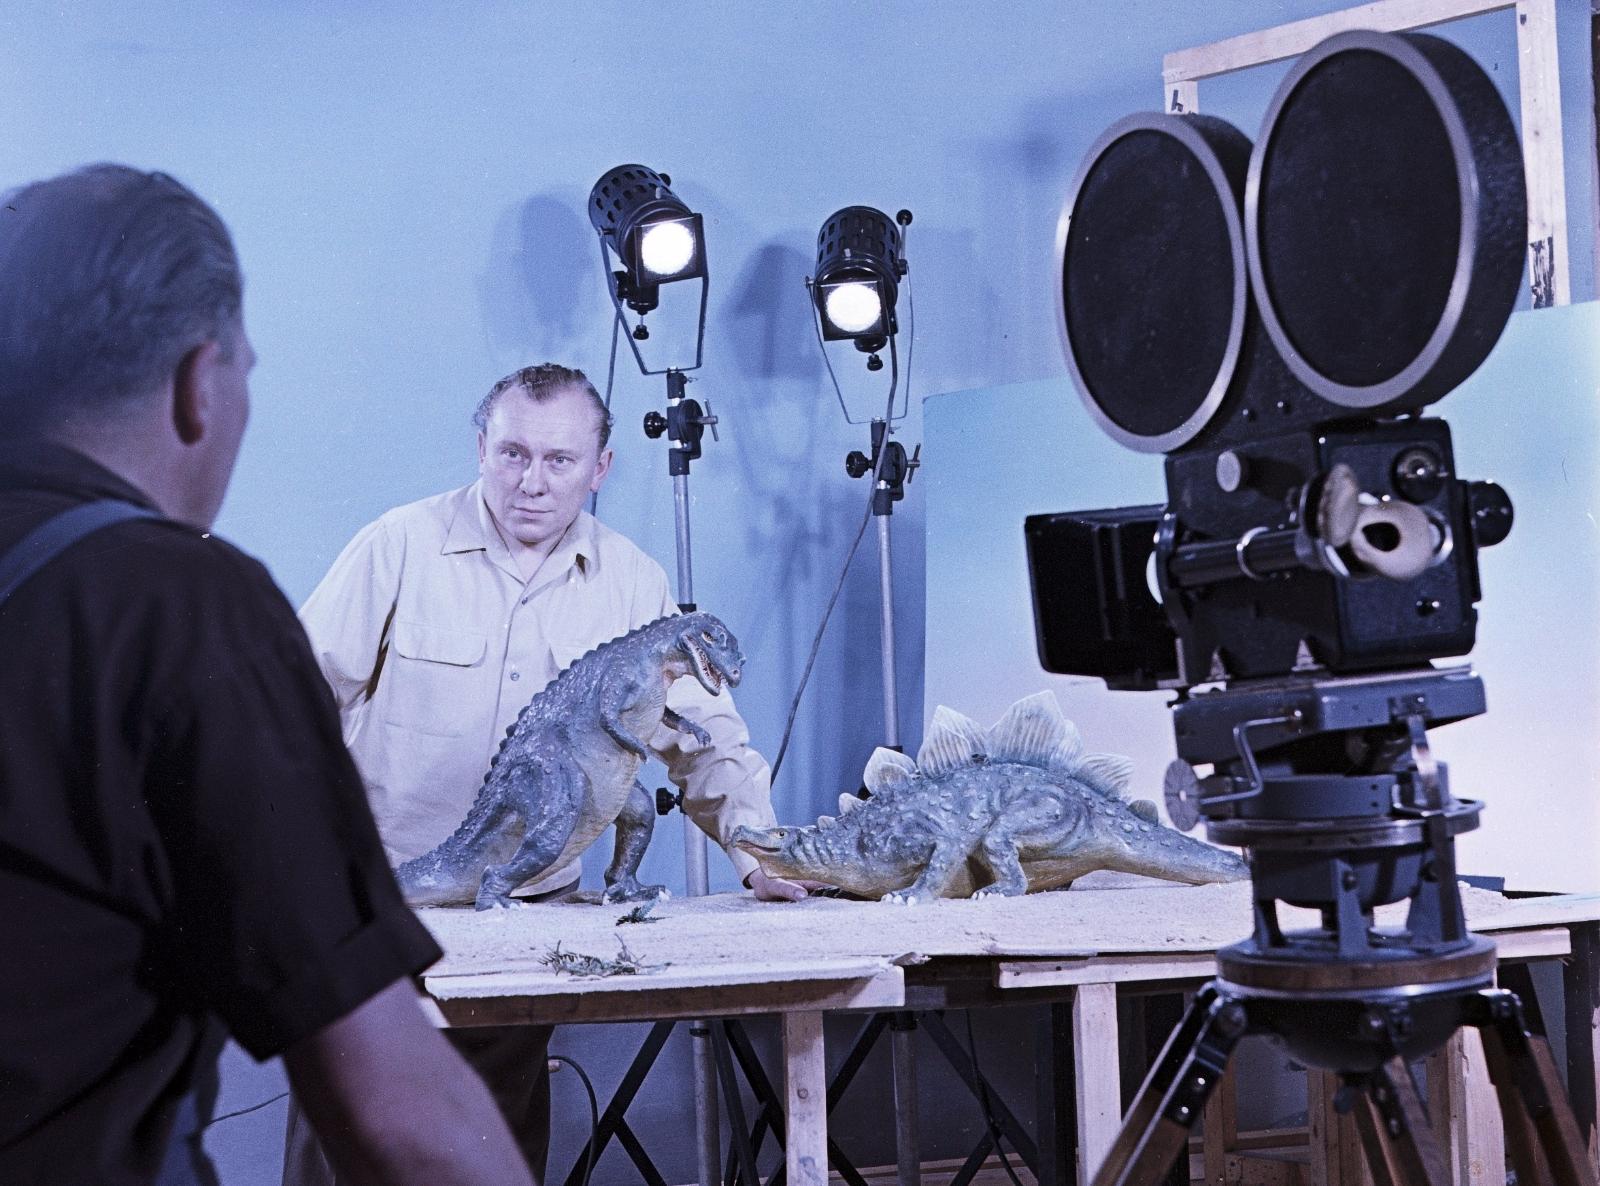 Film Adventurer Karel Zeman (2015) dir. Tomáš Hodan. A testament to the enduring genius of Karel Zeman and his legendary cinematic trickery